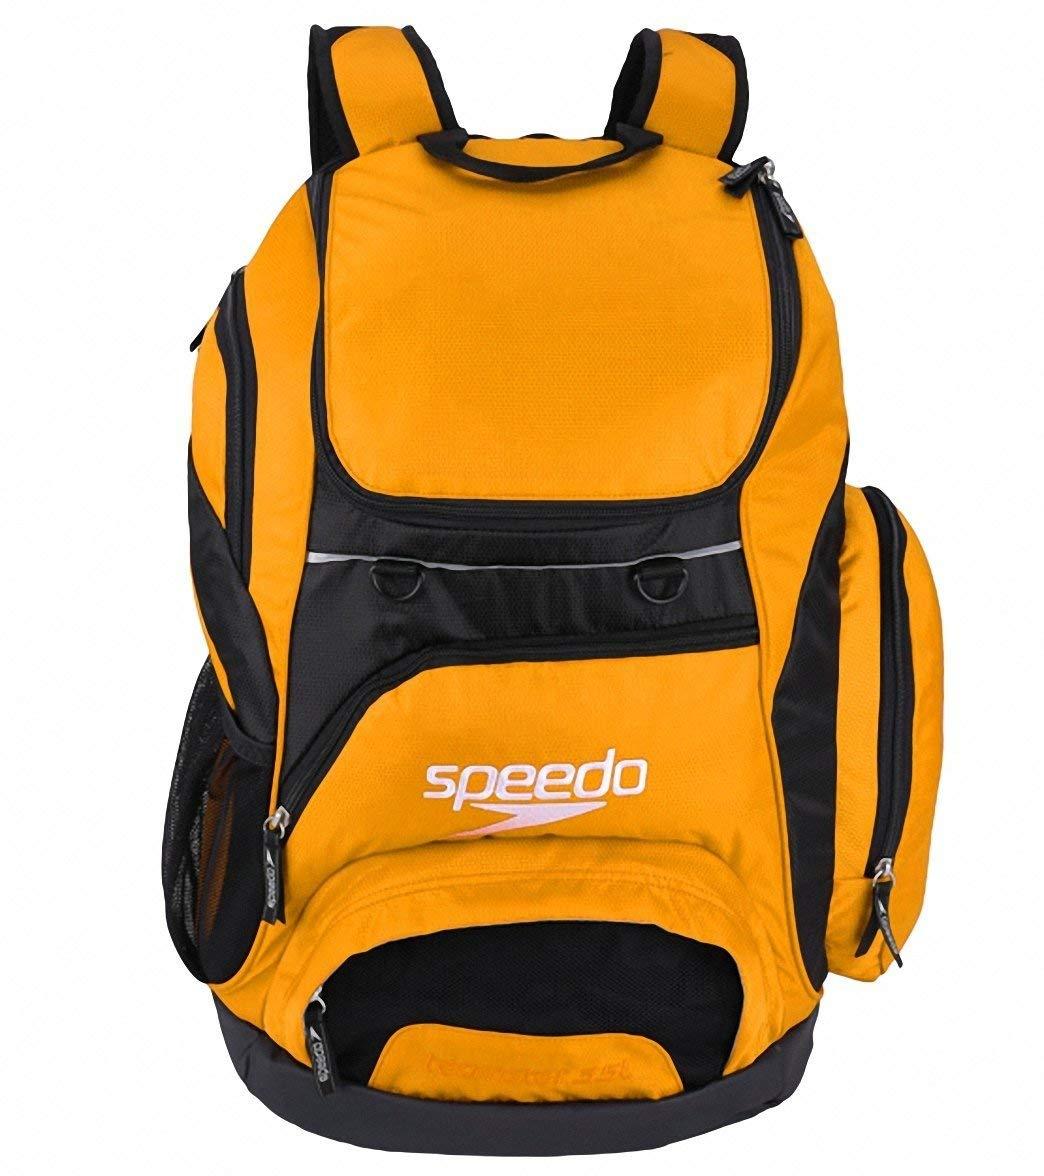 mochila equipaje de mano vueling